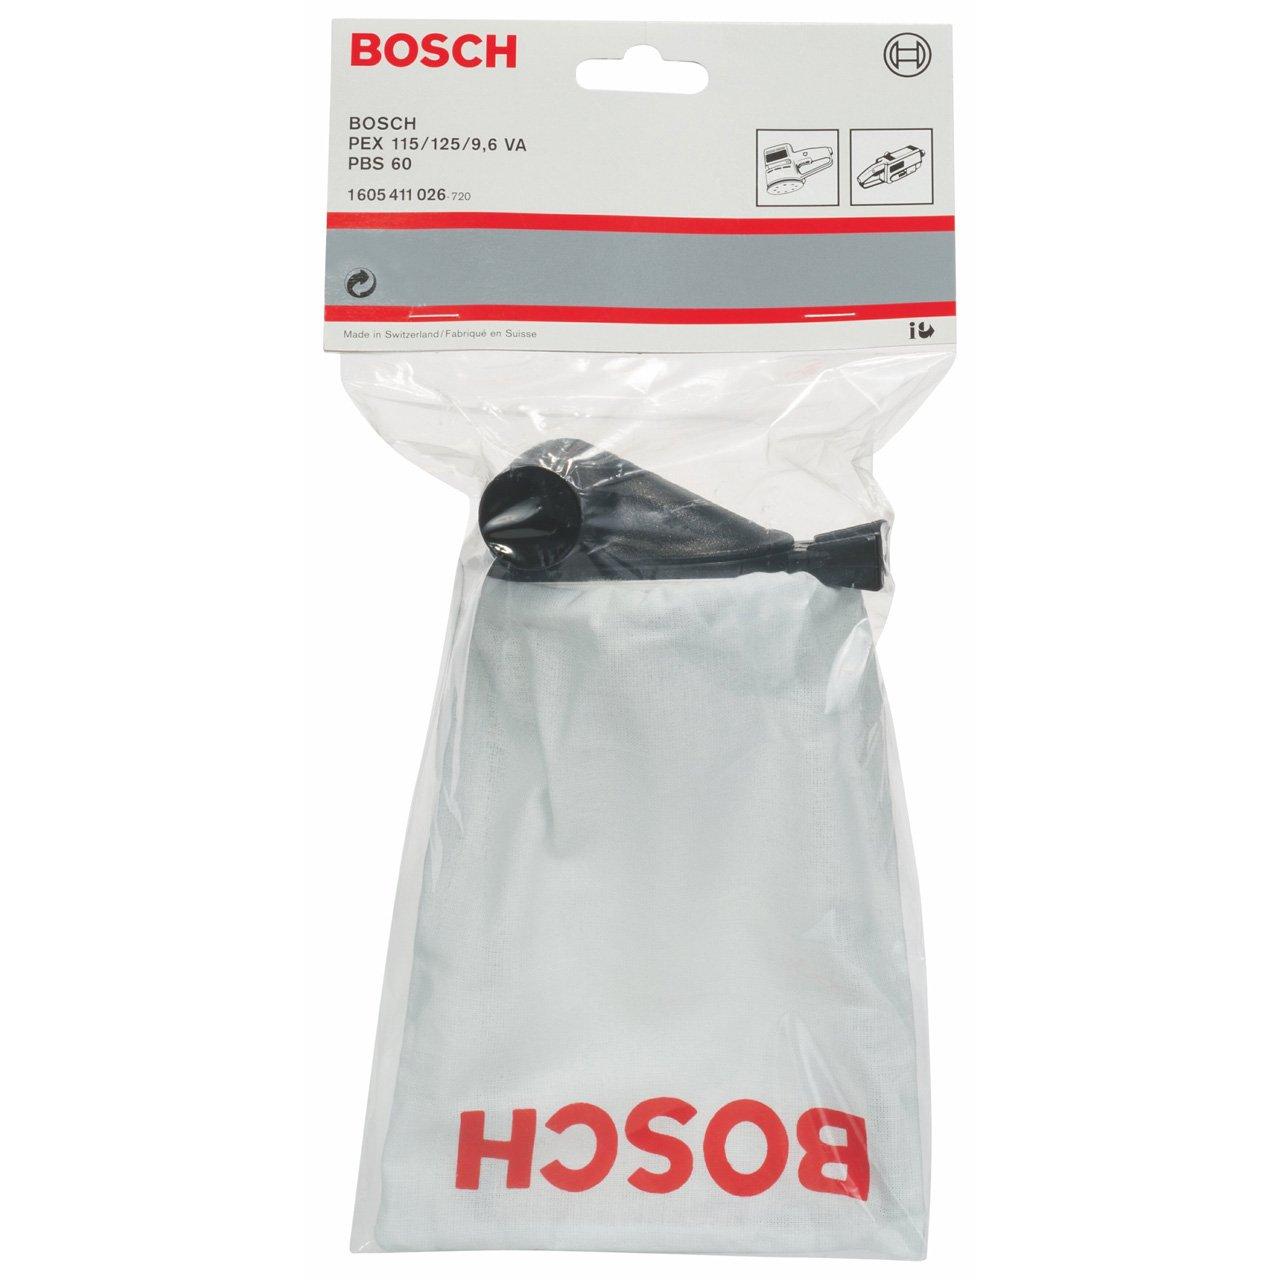 Bosch 1 605 411 026 PBS 60//60 E Saco para polvo para PEX 115 A//125 AE